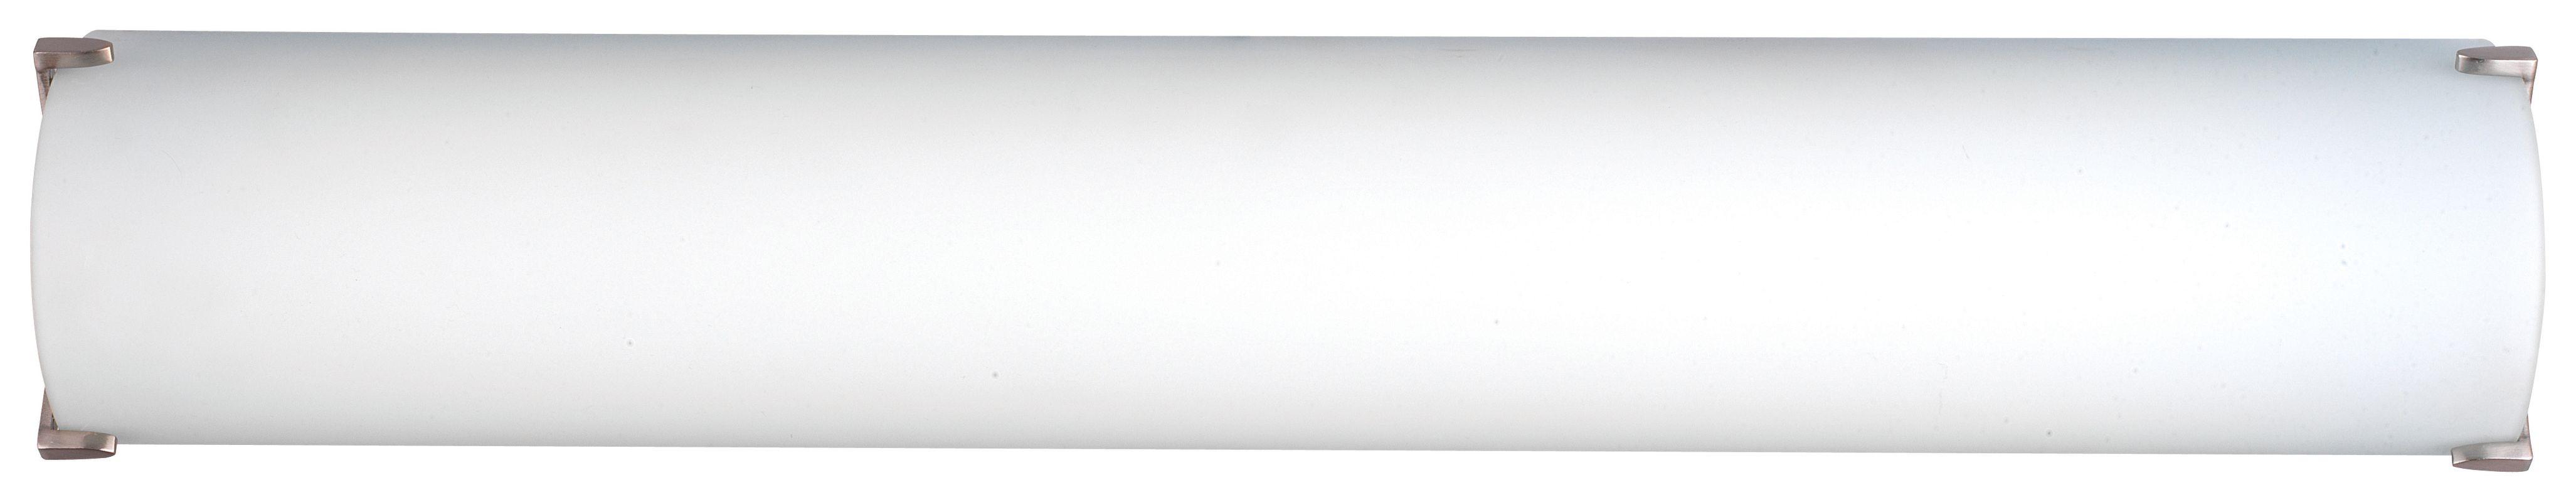 Philips FT0001836 Edge 1 Light Wall Sconce Satin Nickel Indoor